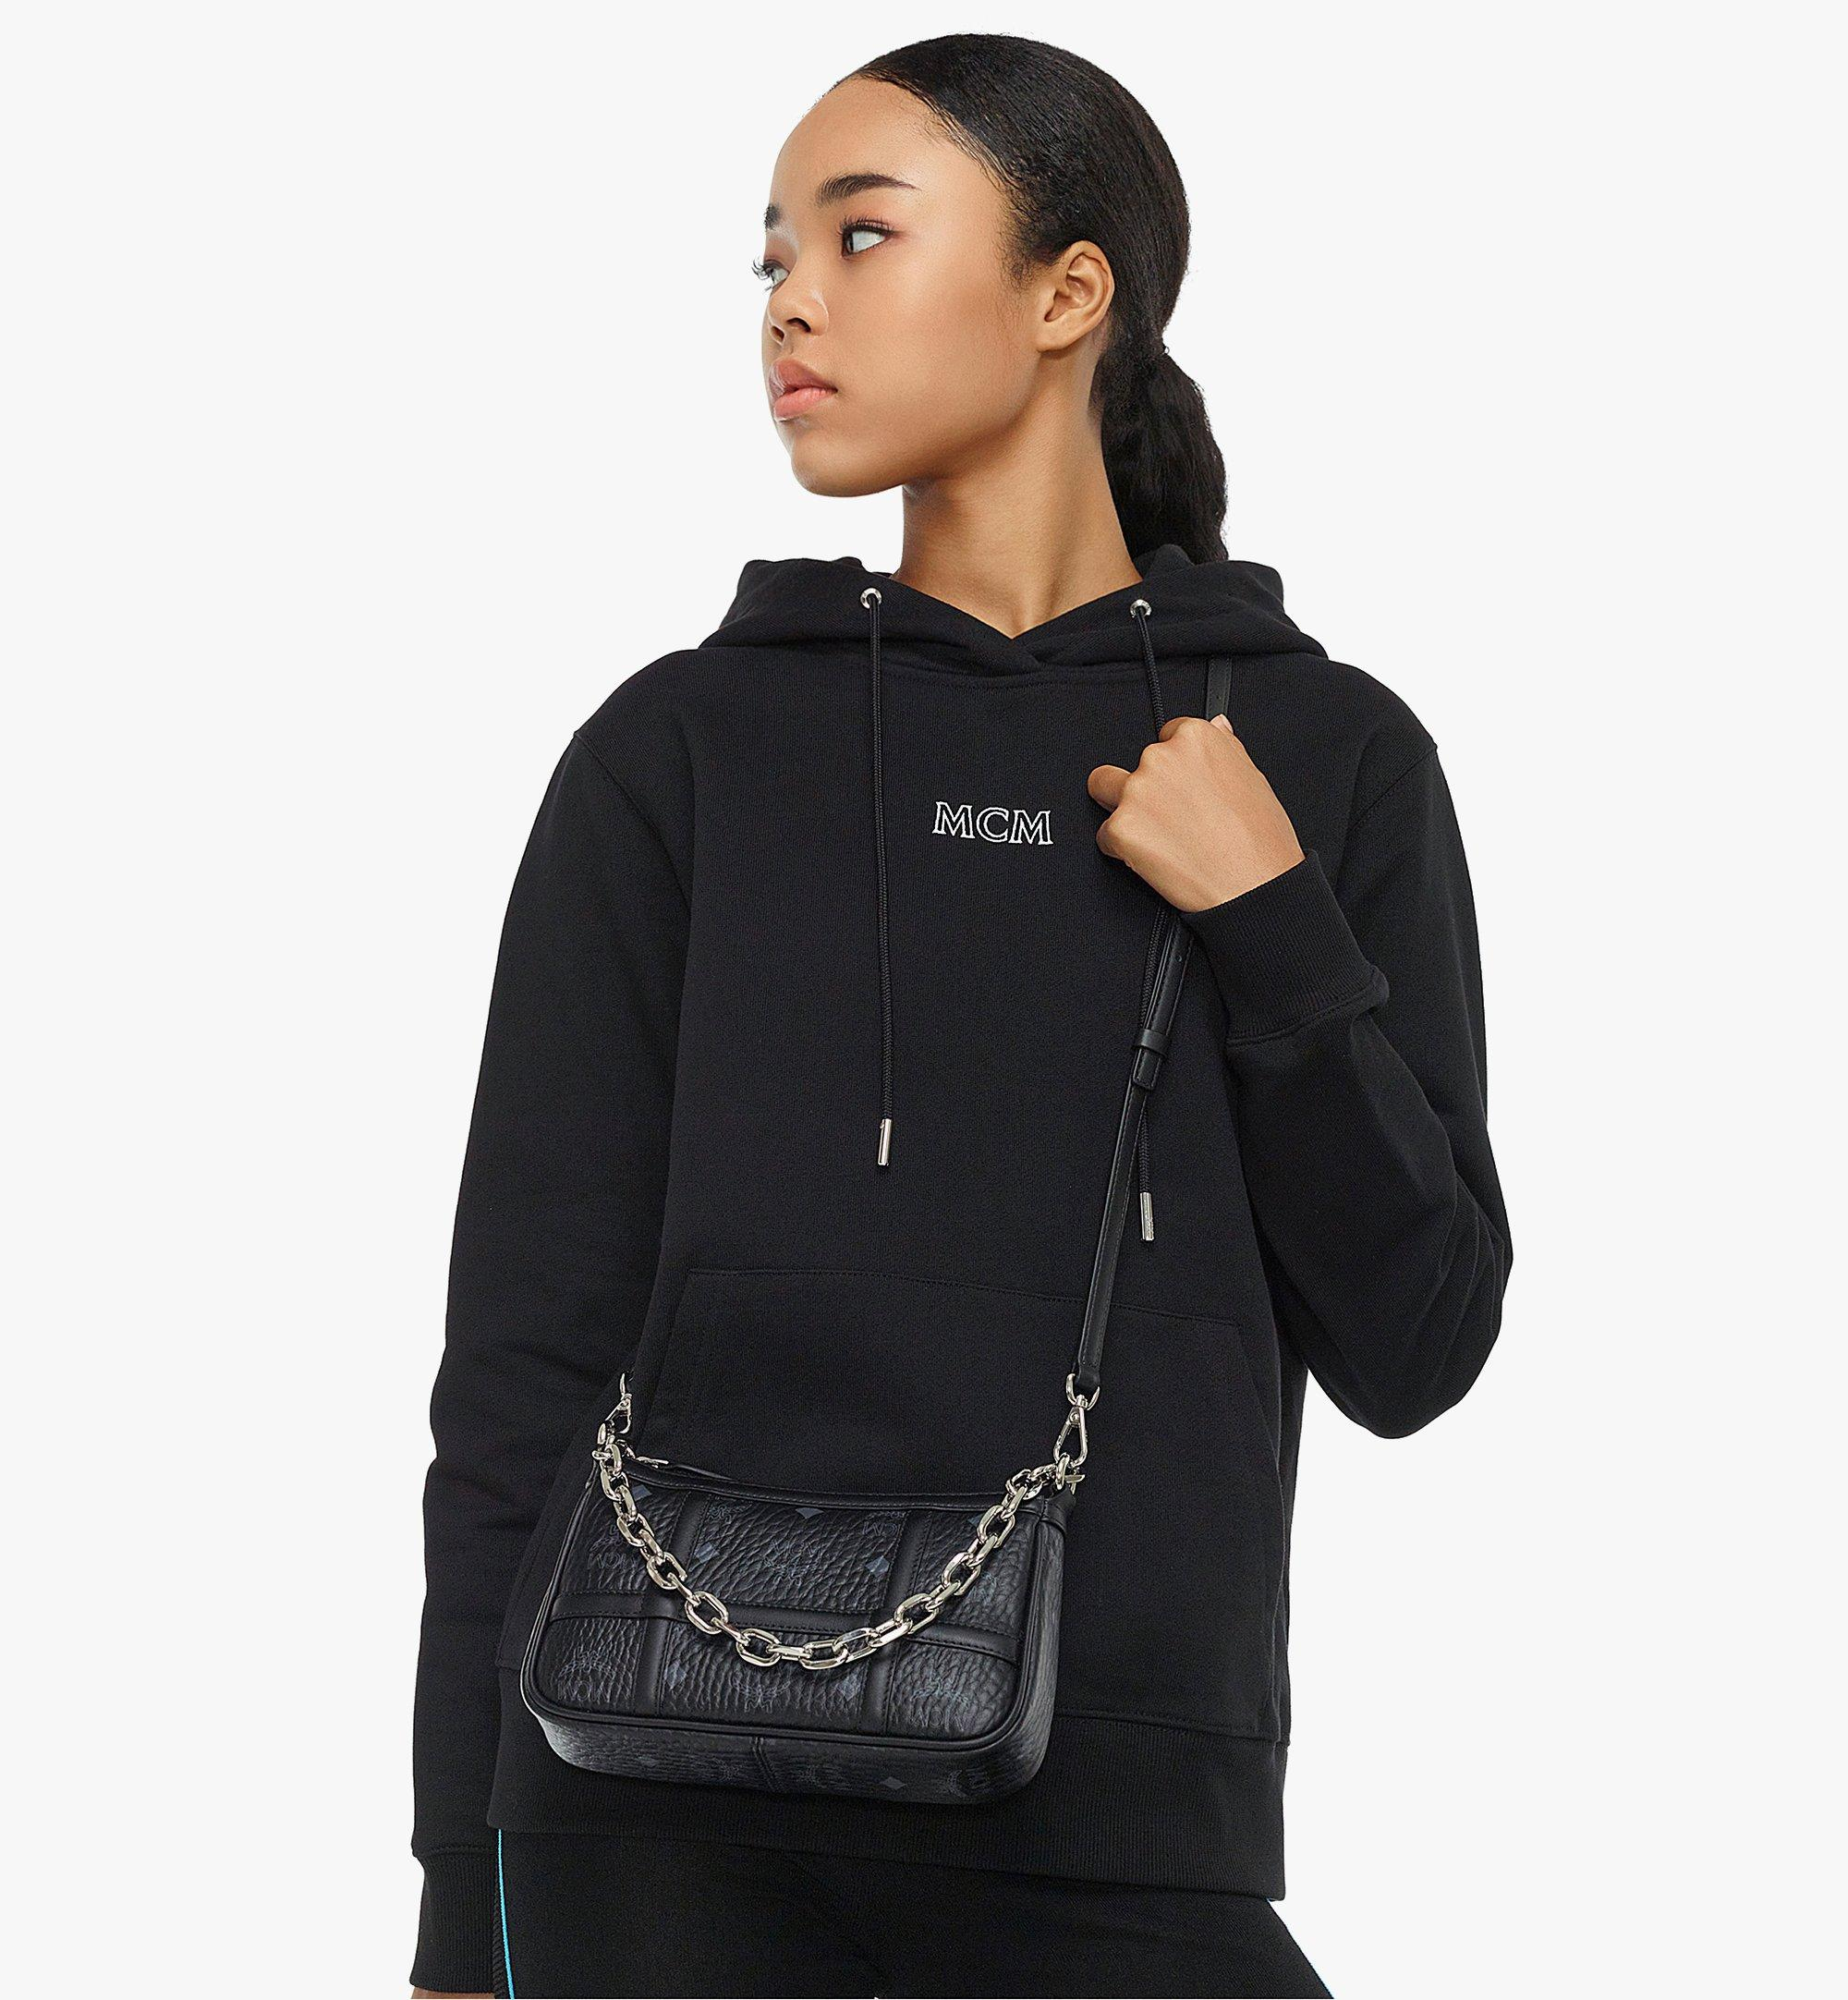 MCM Delmy Shoulder Bag in Visetos Black MWSBAER01BK001 Alternate View 3